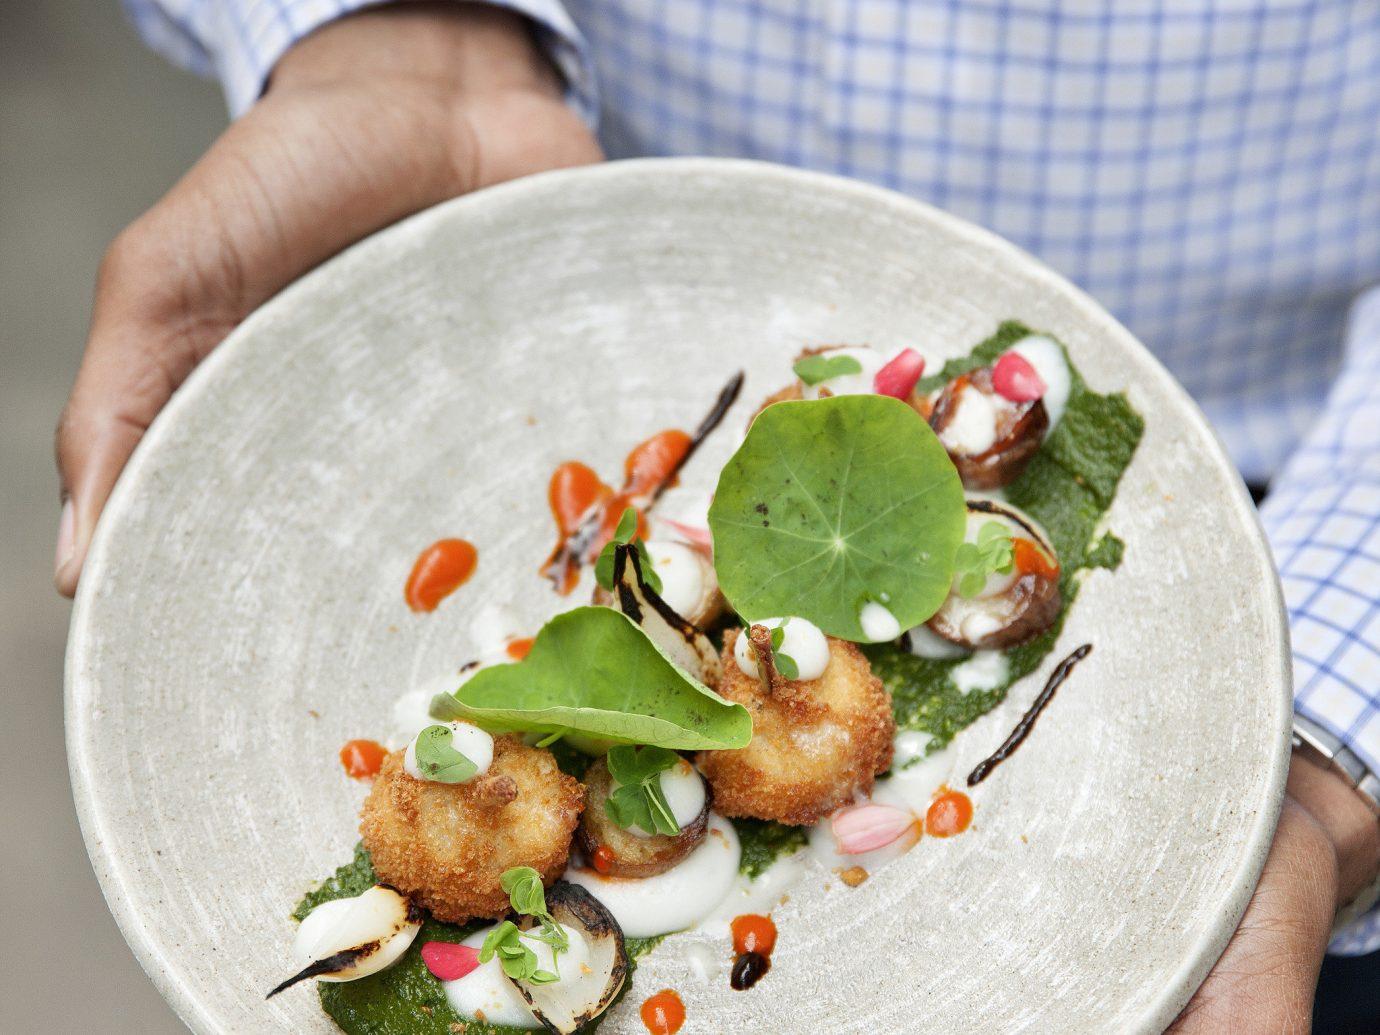 Food + Drink person food dish plate indoor meal produce vegetable cuisine sense breakfast